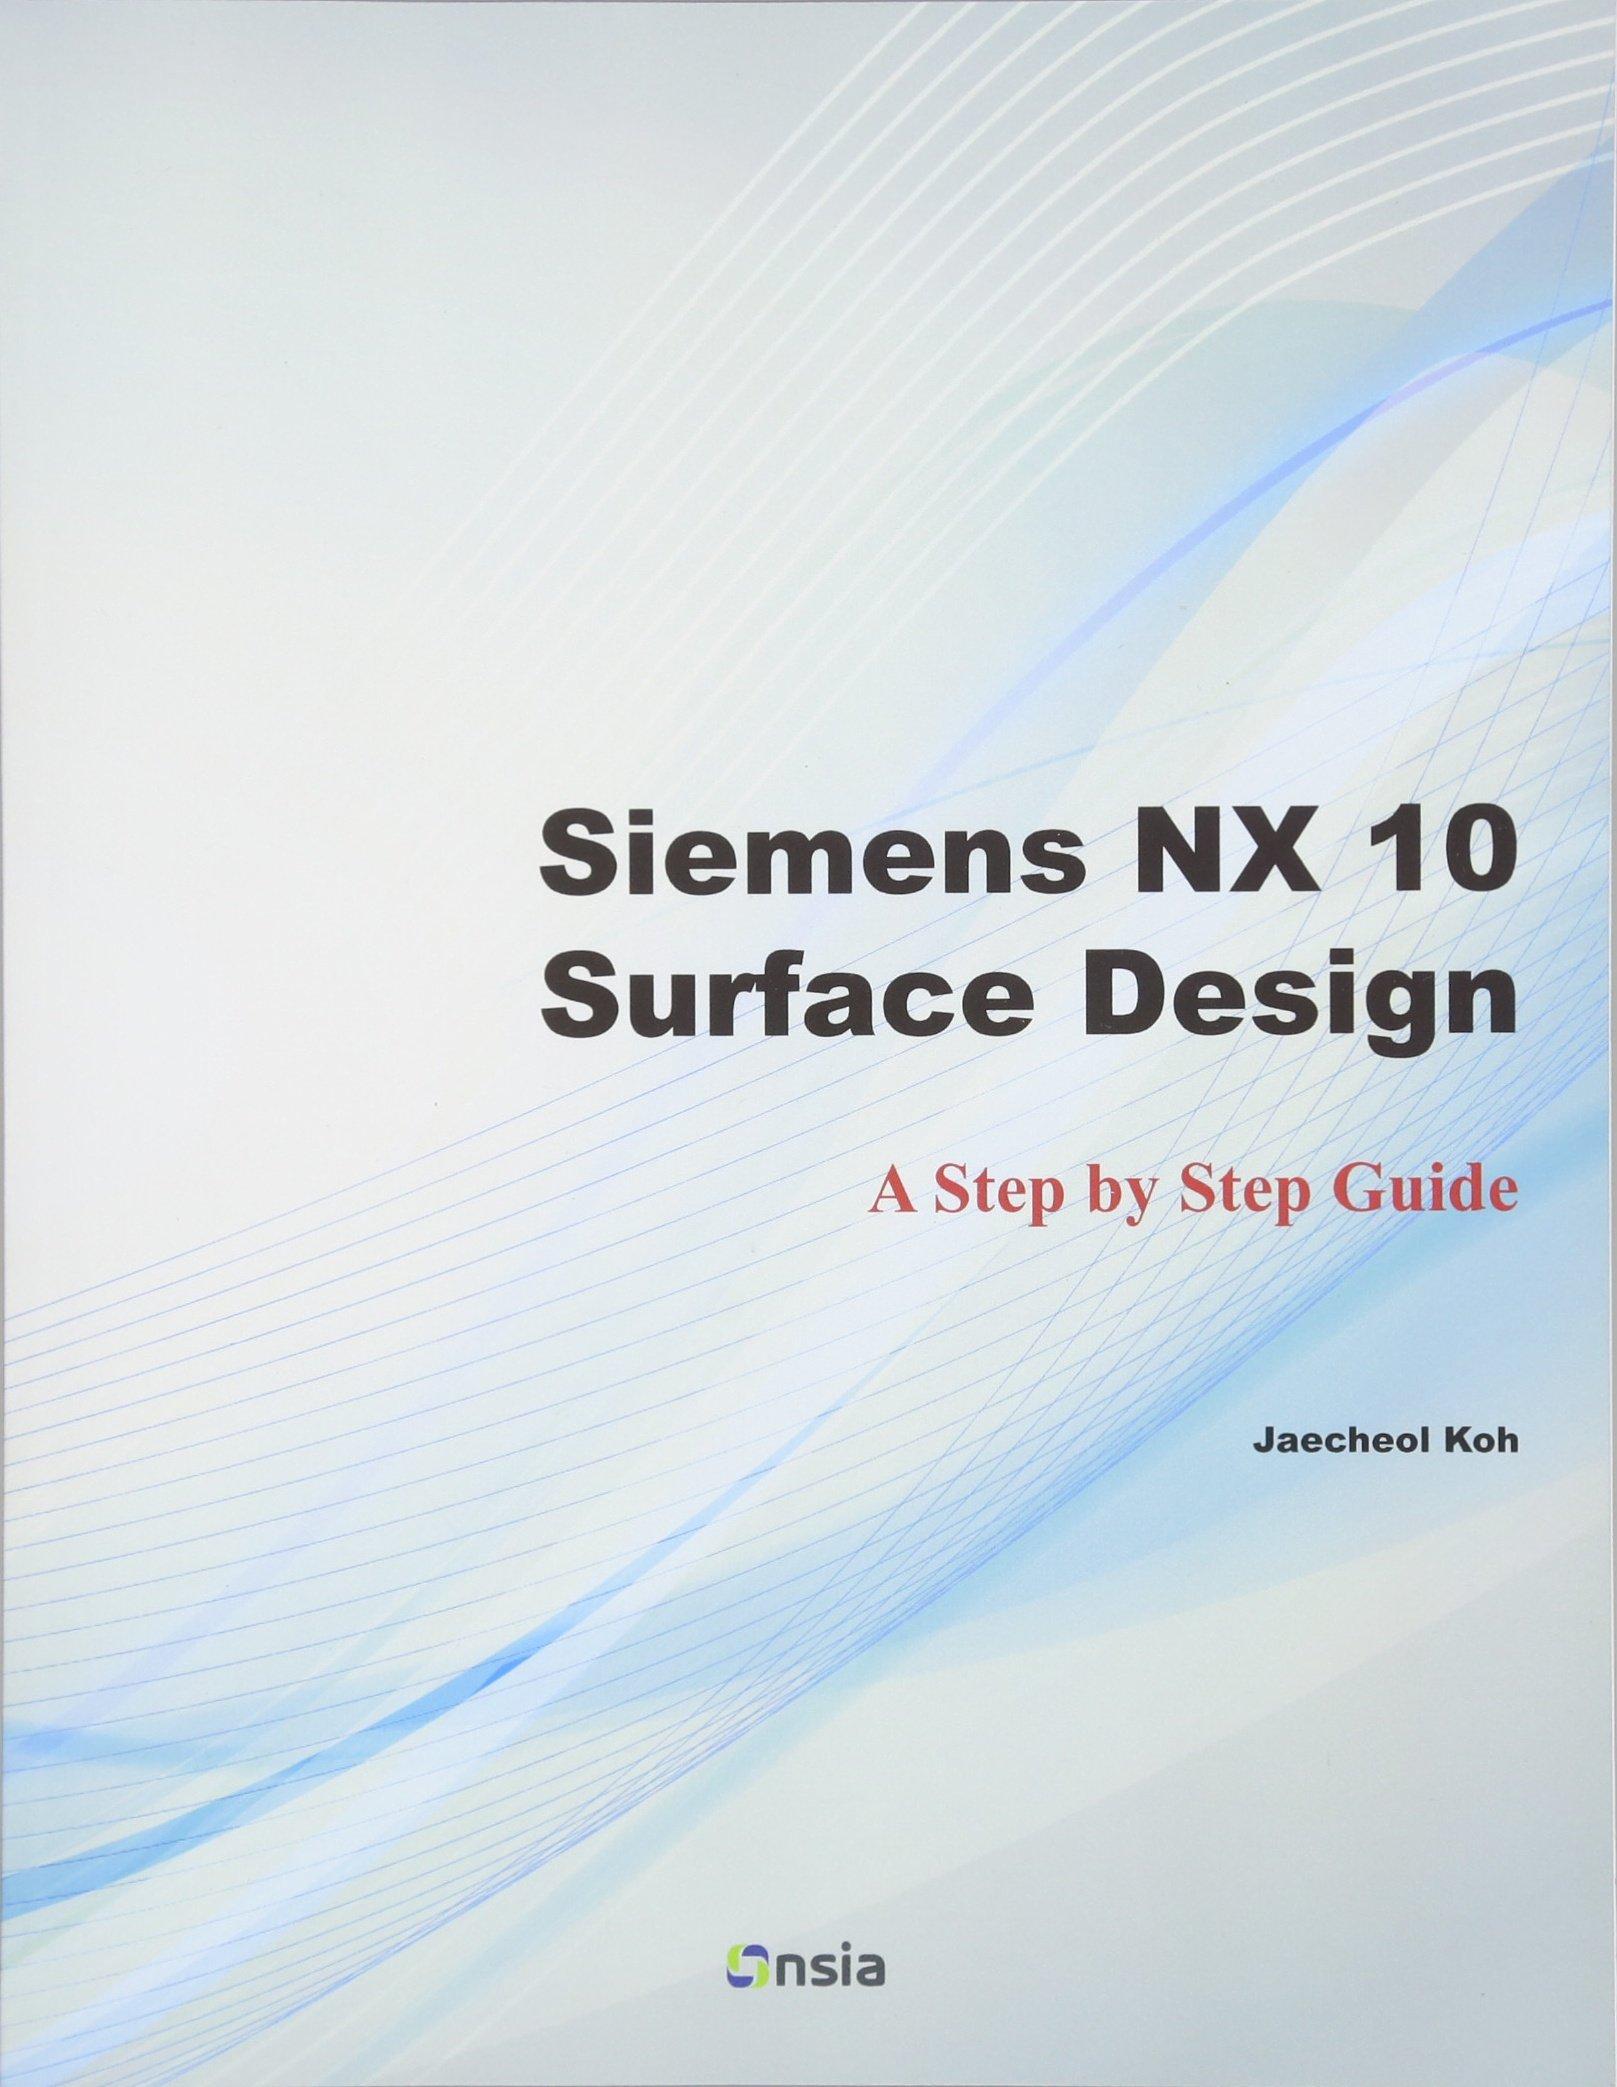 Siemens NX 10 Surface Design: A Step by Step Guide: Jaecheol